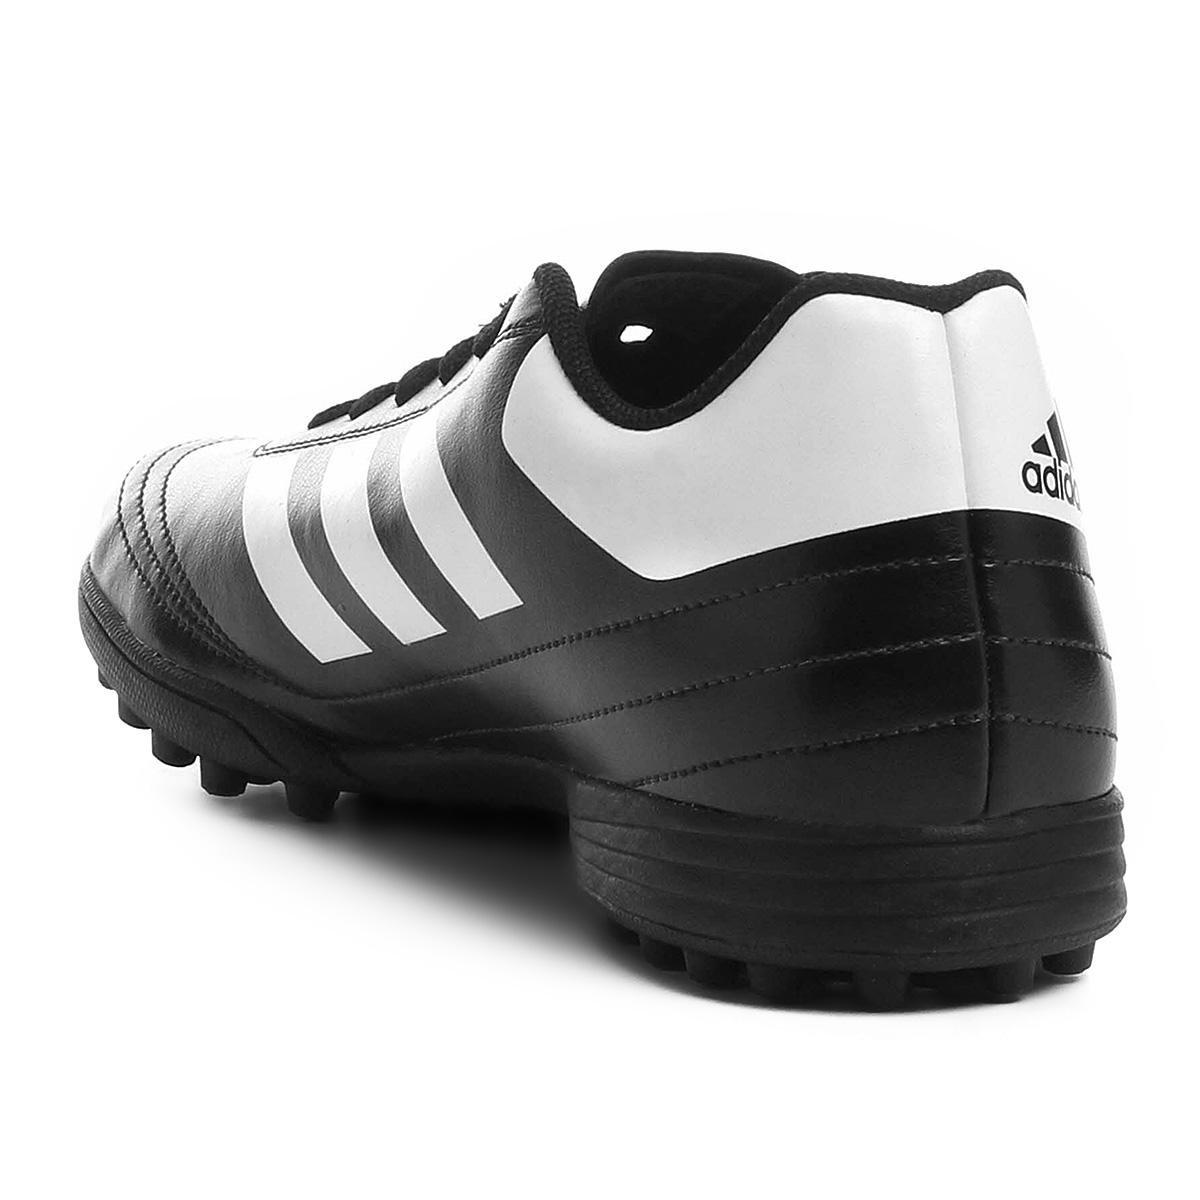 Chuteira Society Adidas Goletto 6 TF - Preto - Compre Agora  088633b65f6e2